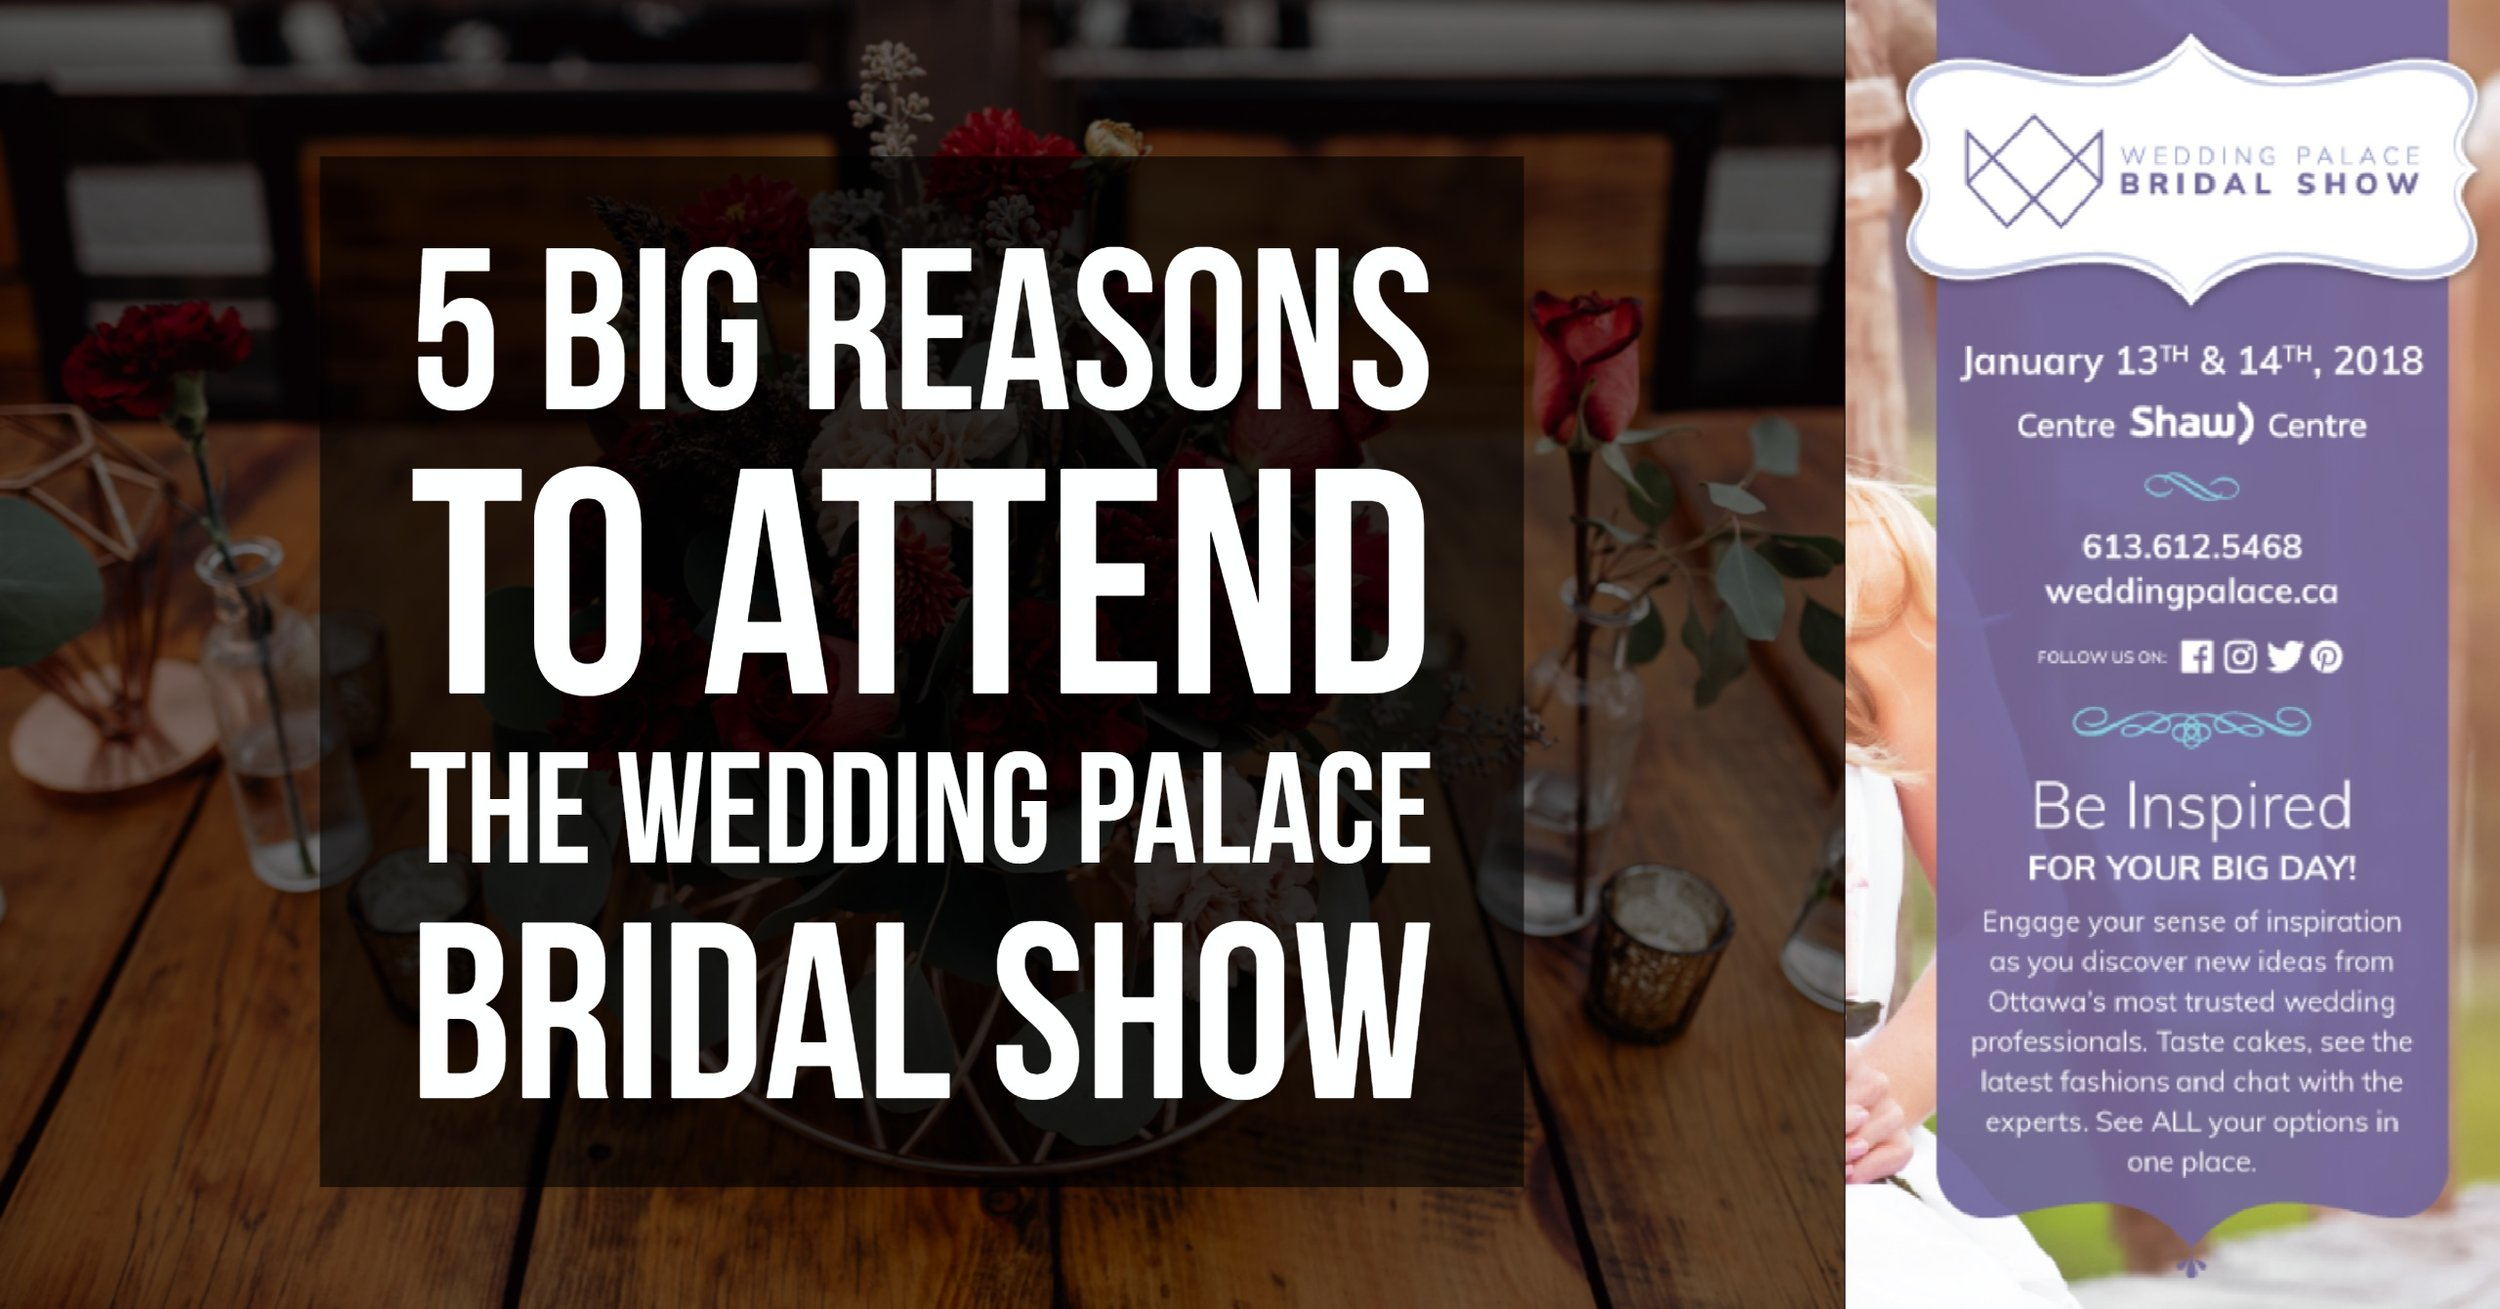 Mocha Tree Studios Ottawa Wedding and Engagement Photographer and Videographer Dark Moody Intimate Authentic Modern Romantic Cinematic Best Candid Wedding Palace